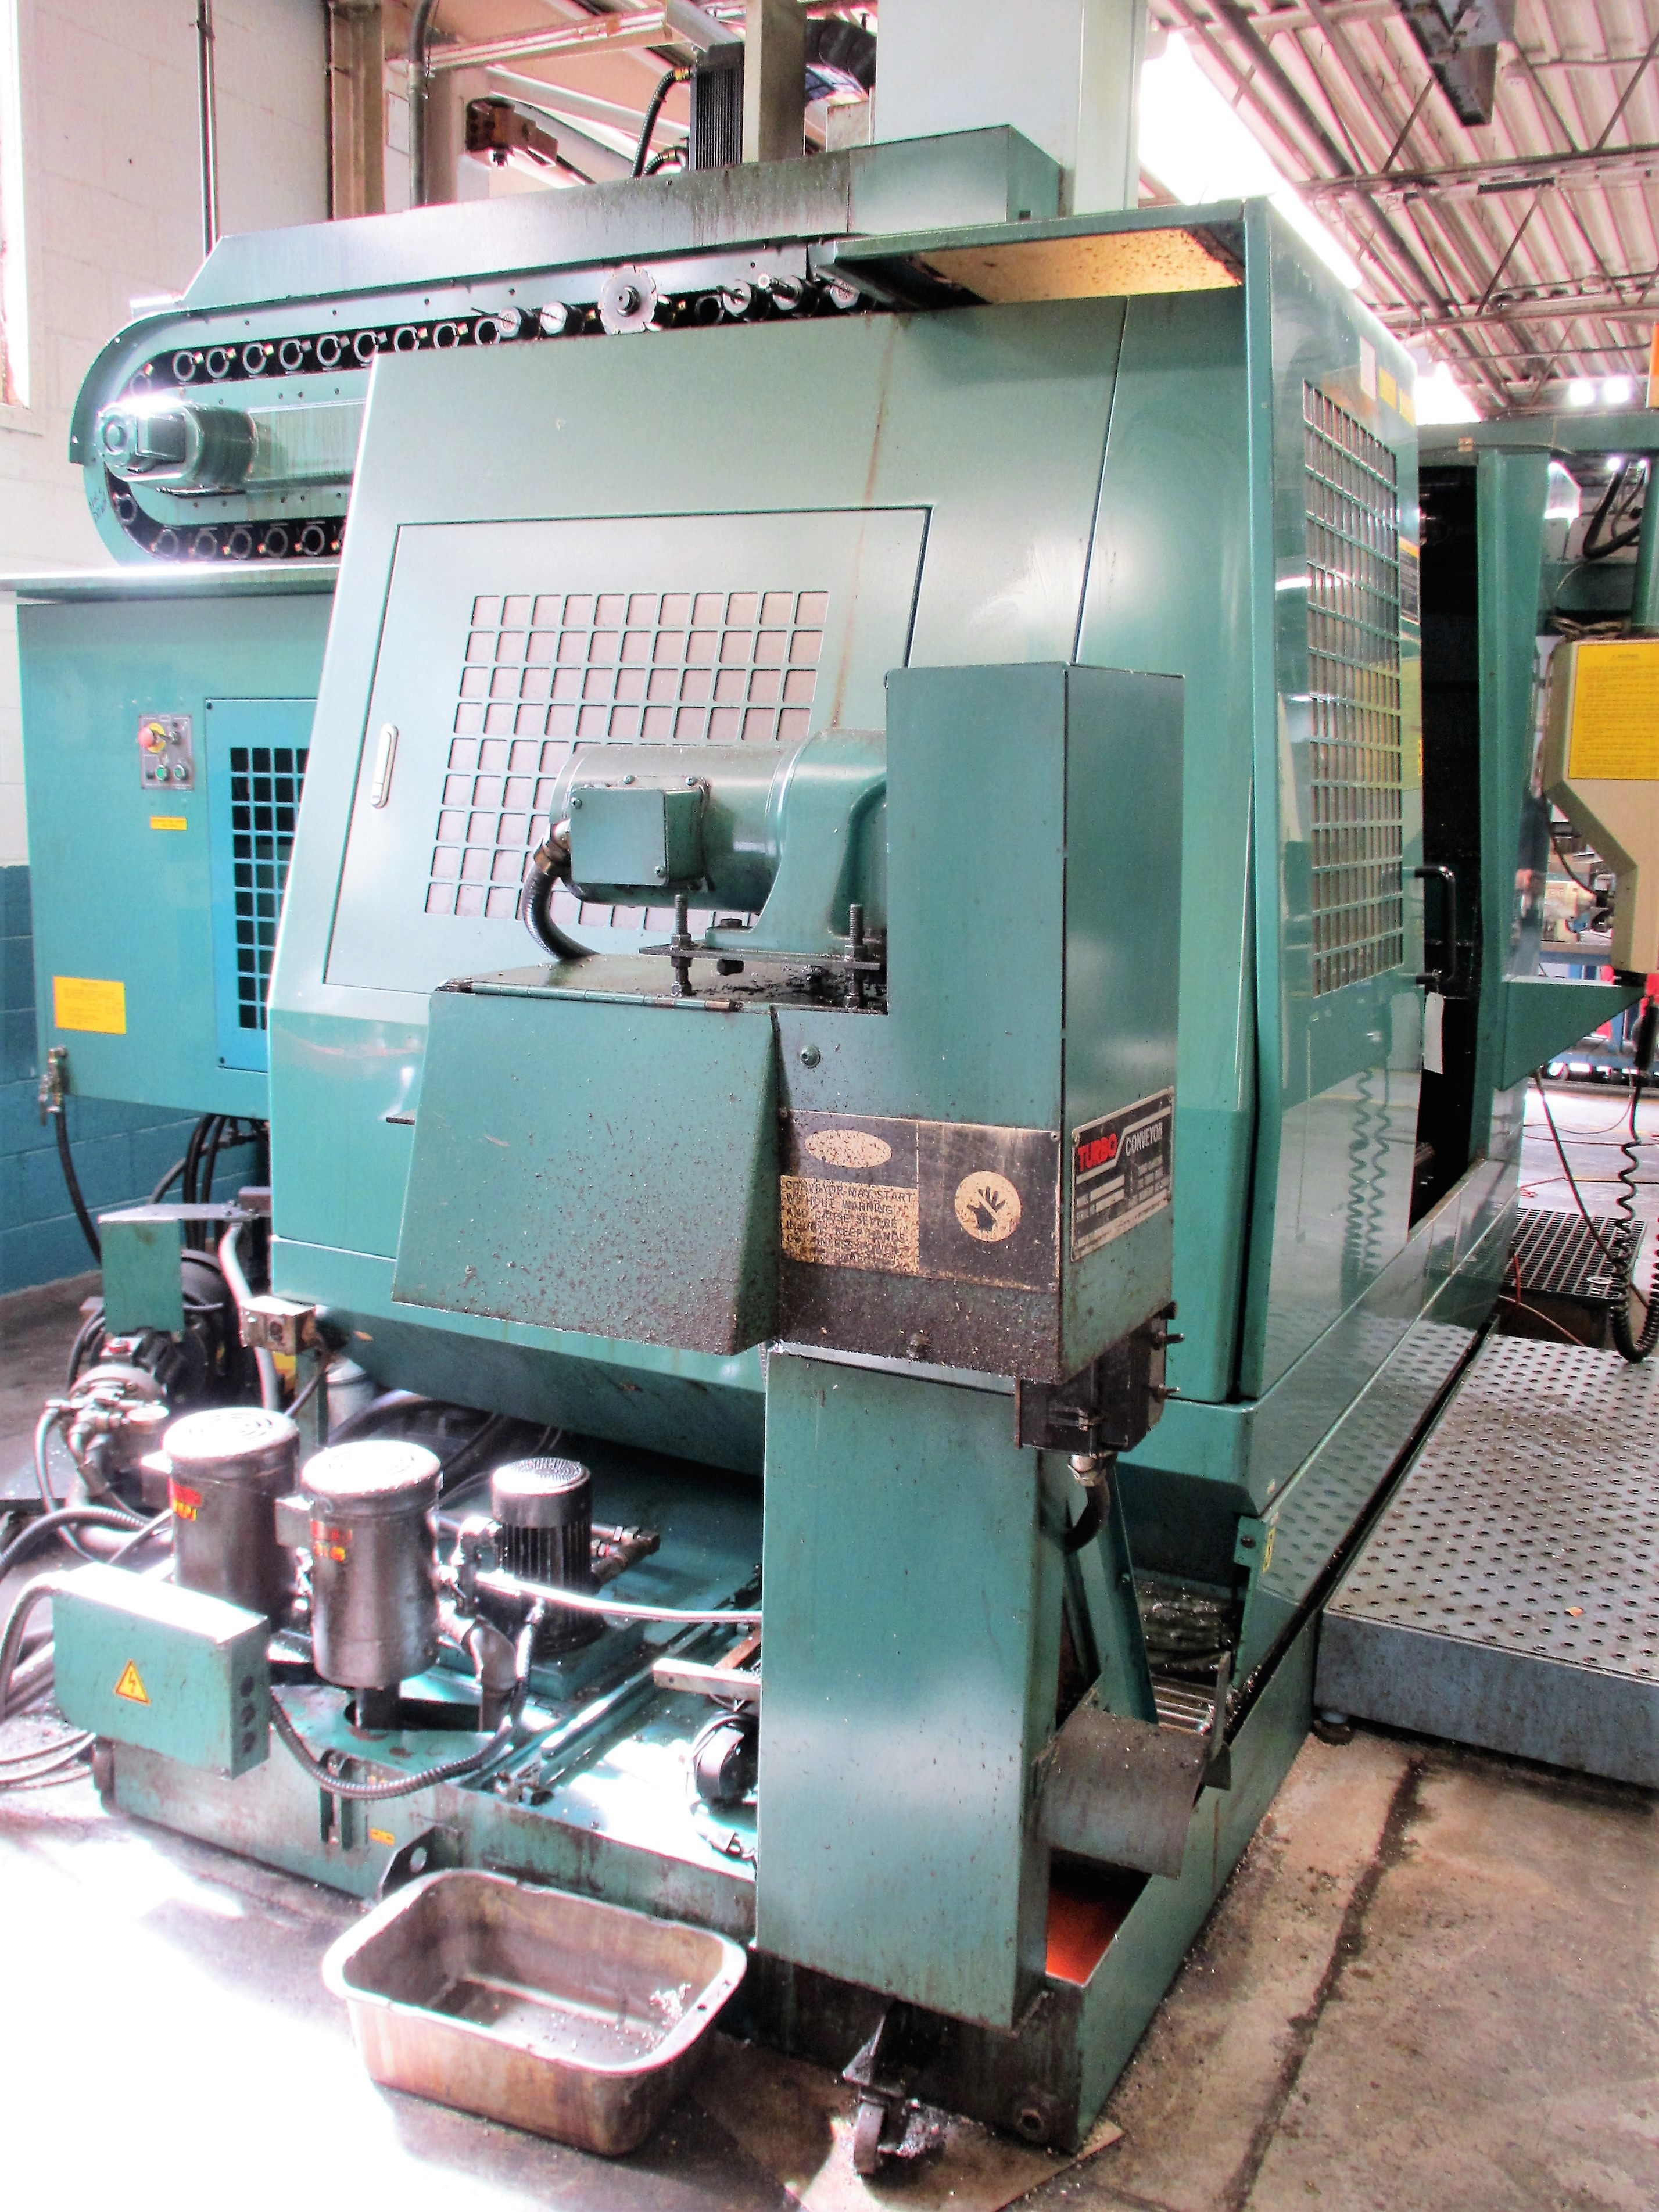 MATSUURA RA-4F CNC VERTICAL MACHINING CENTER WITH APC - Image 8 of 12